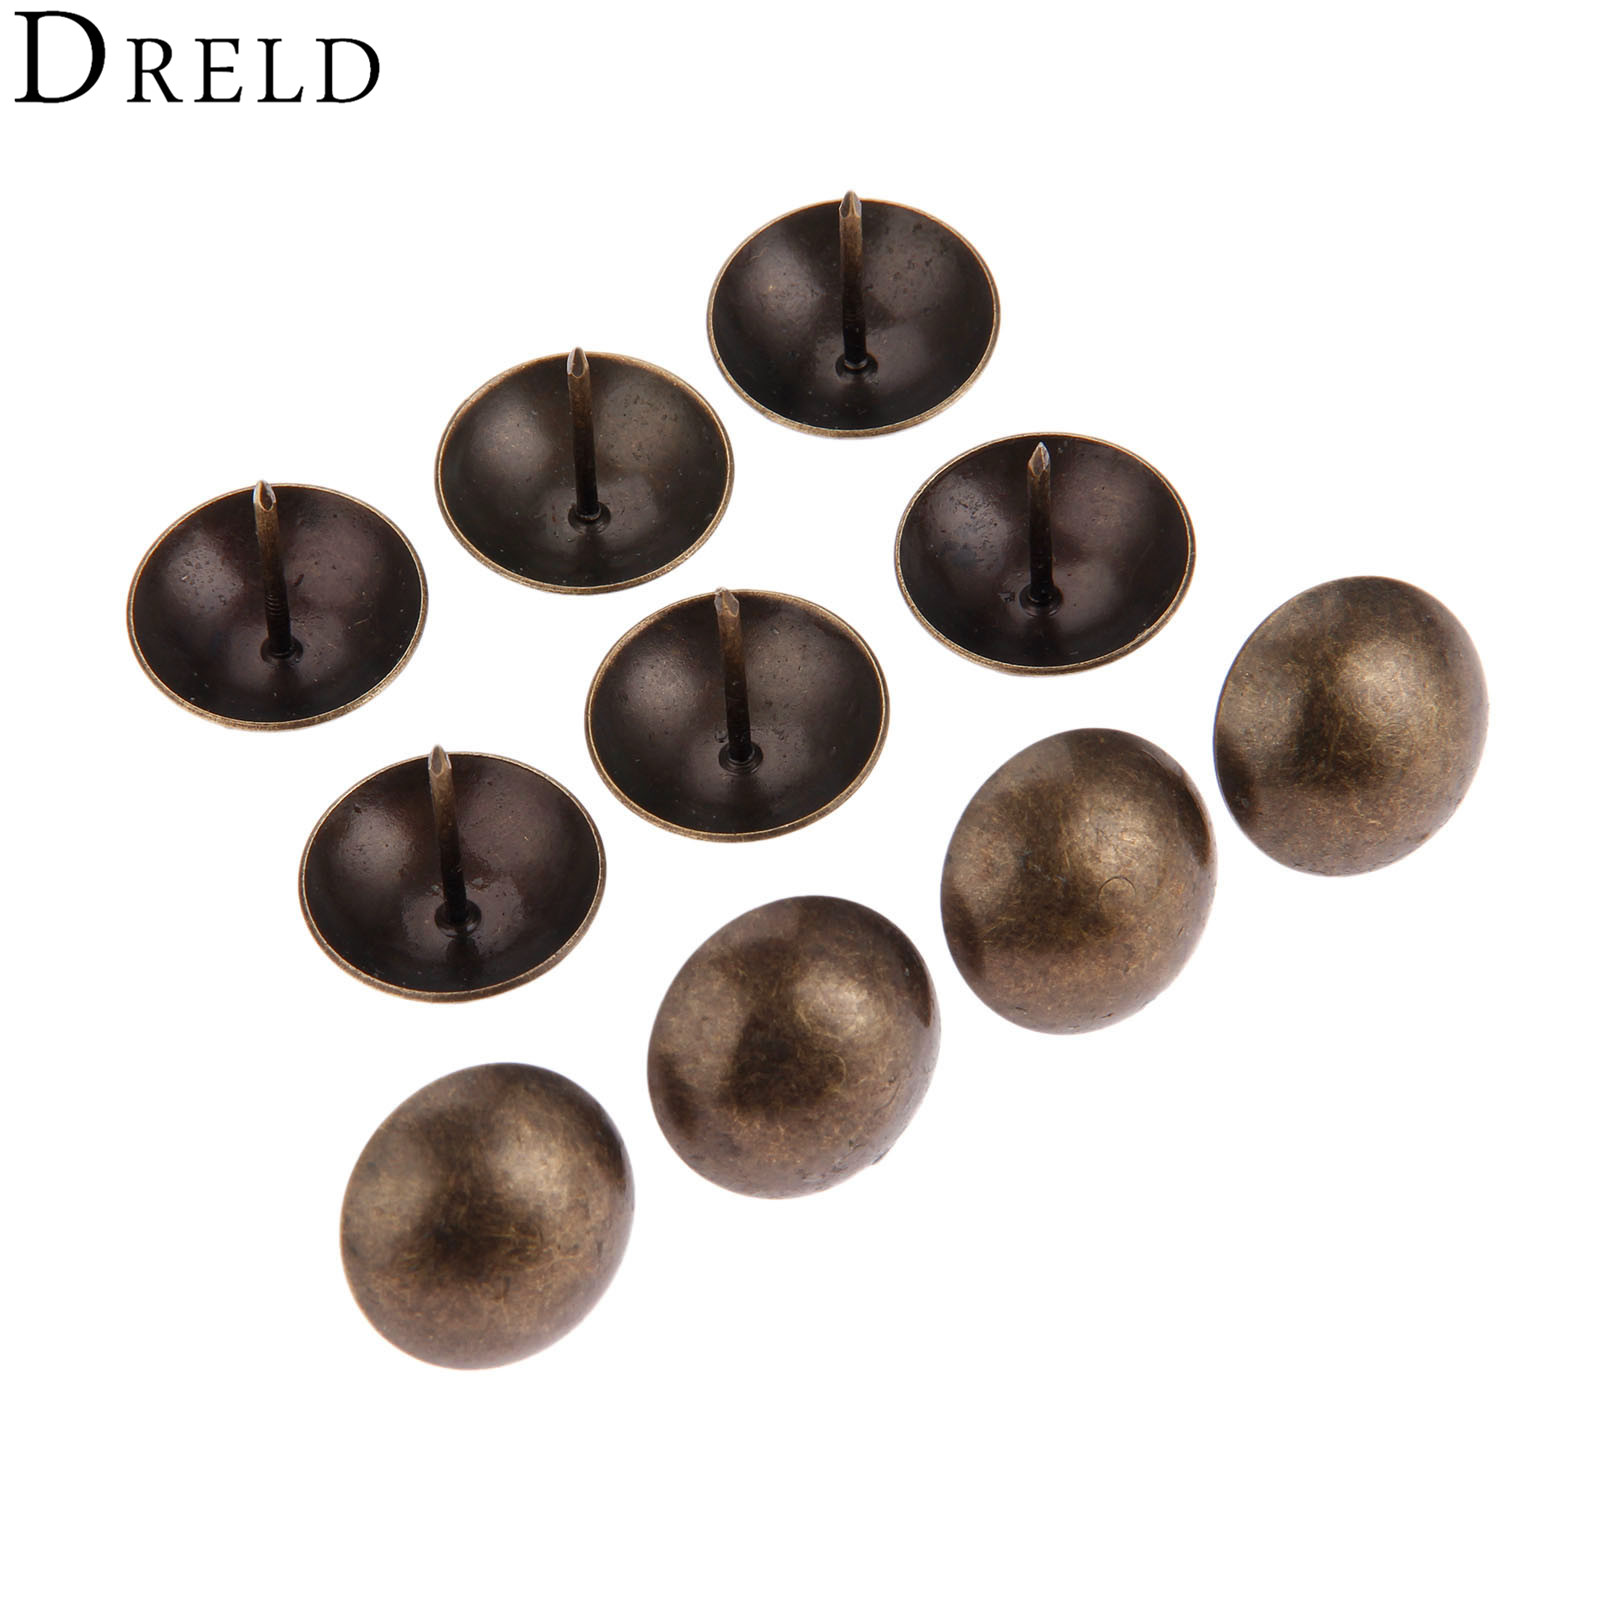 DRELD 10Pcs 25*25mm Iron Upholstery Nail Tachas Jewelry Gift Box Door Sofa Furniture Decorative Tack Stud Pushpin Antique Bronze